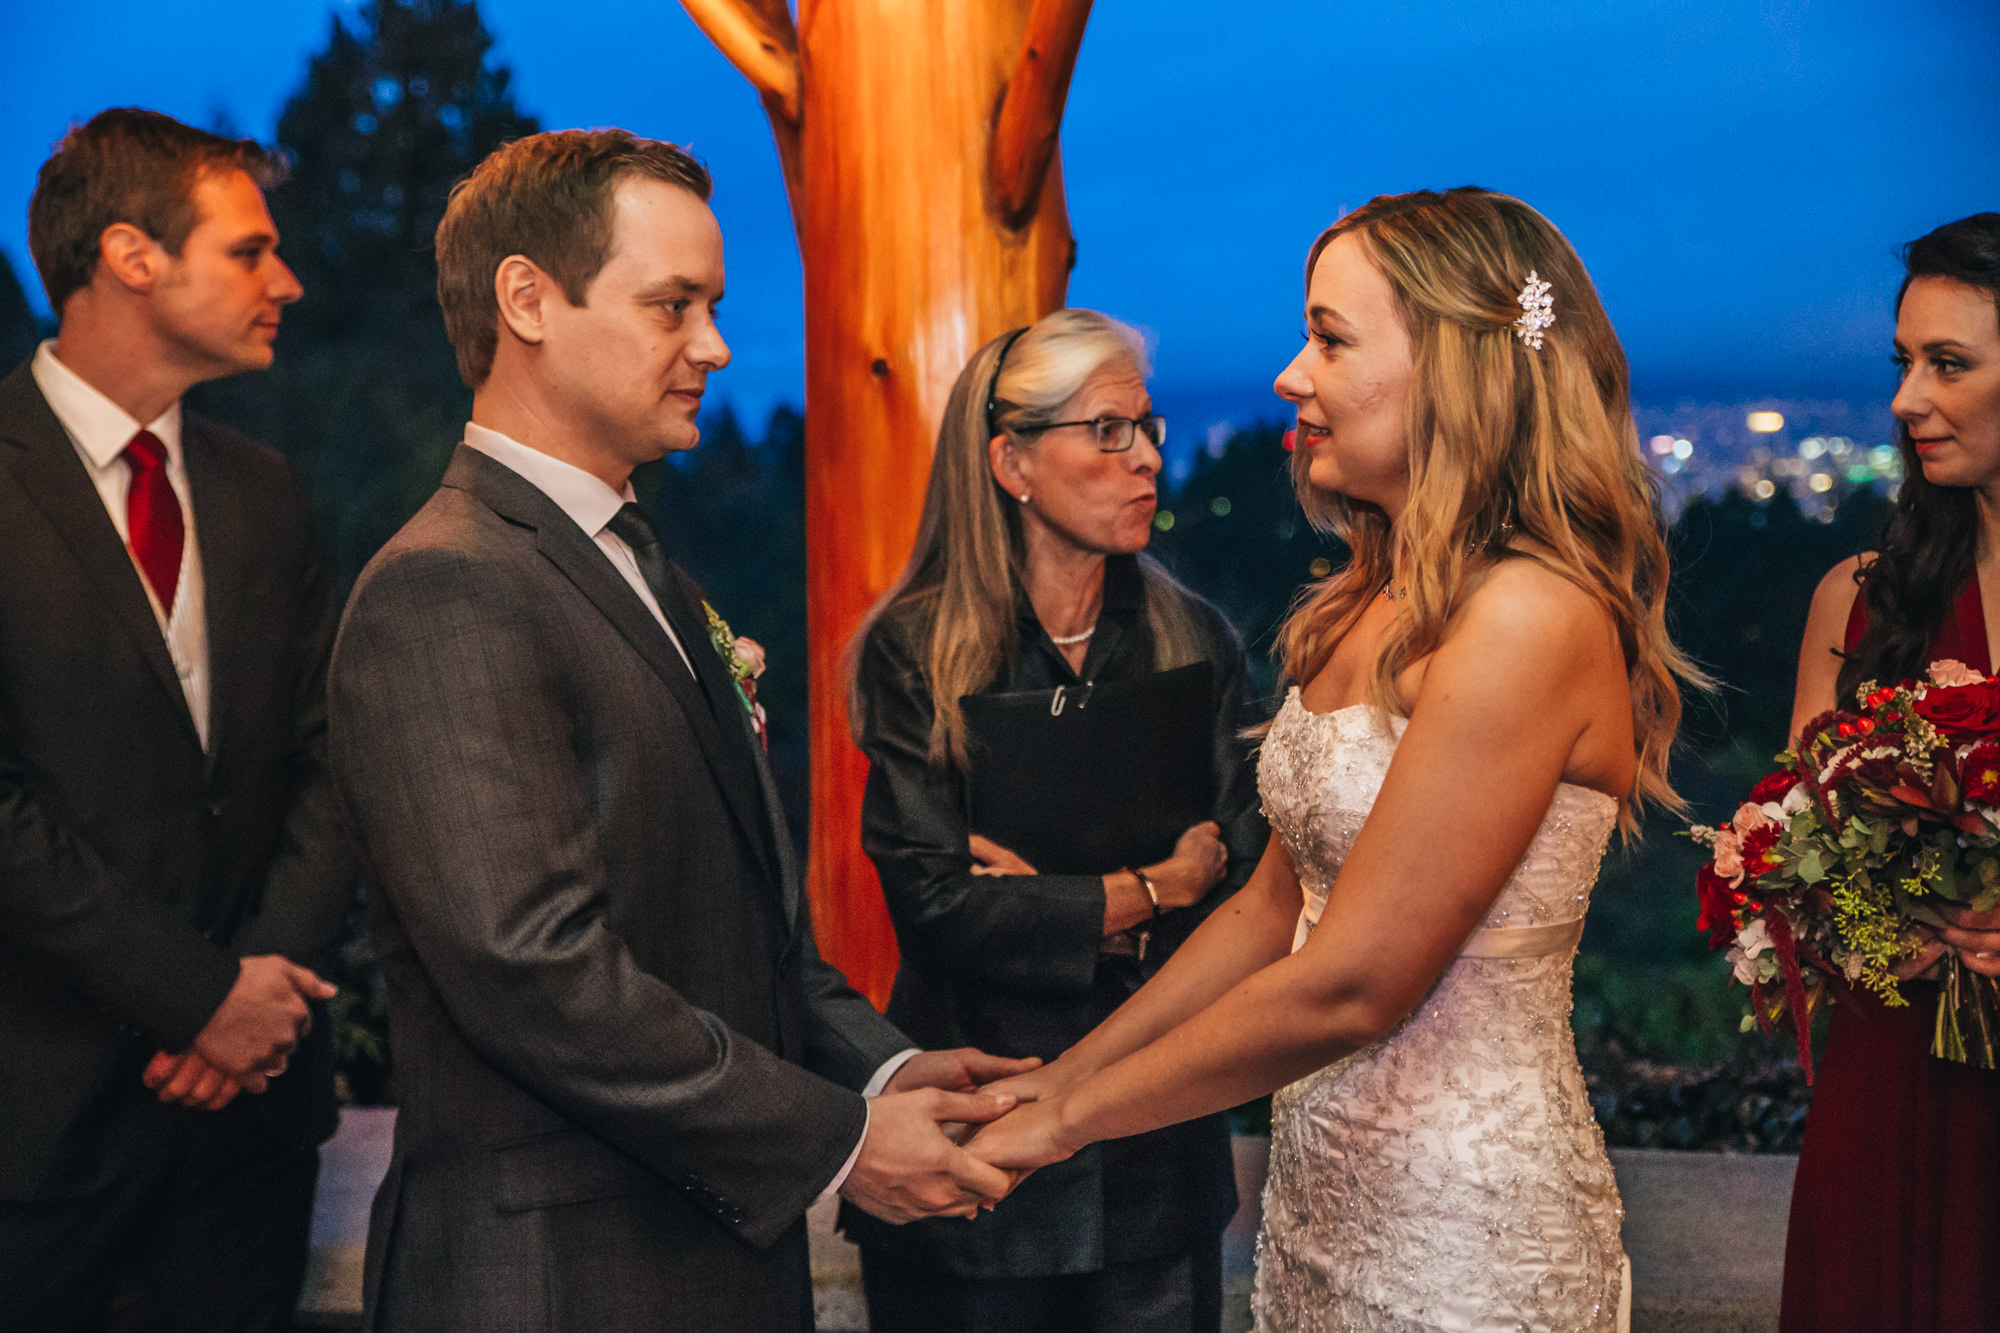 22-seasons-in-the-park-wedding-ceremony.jpg